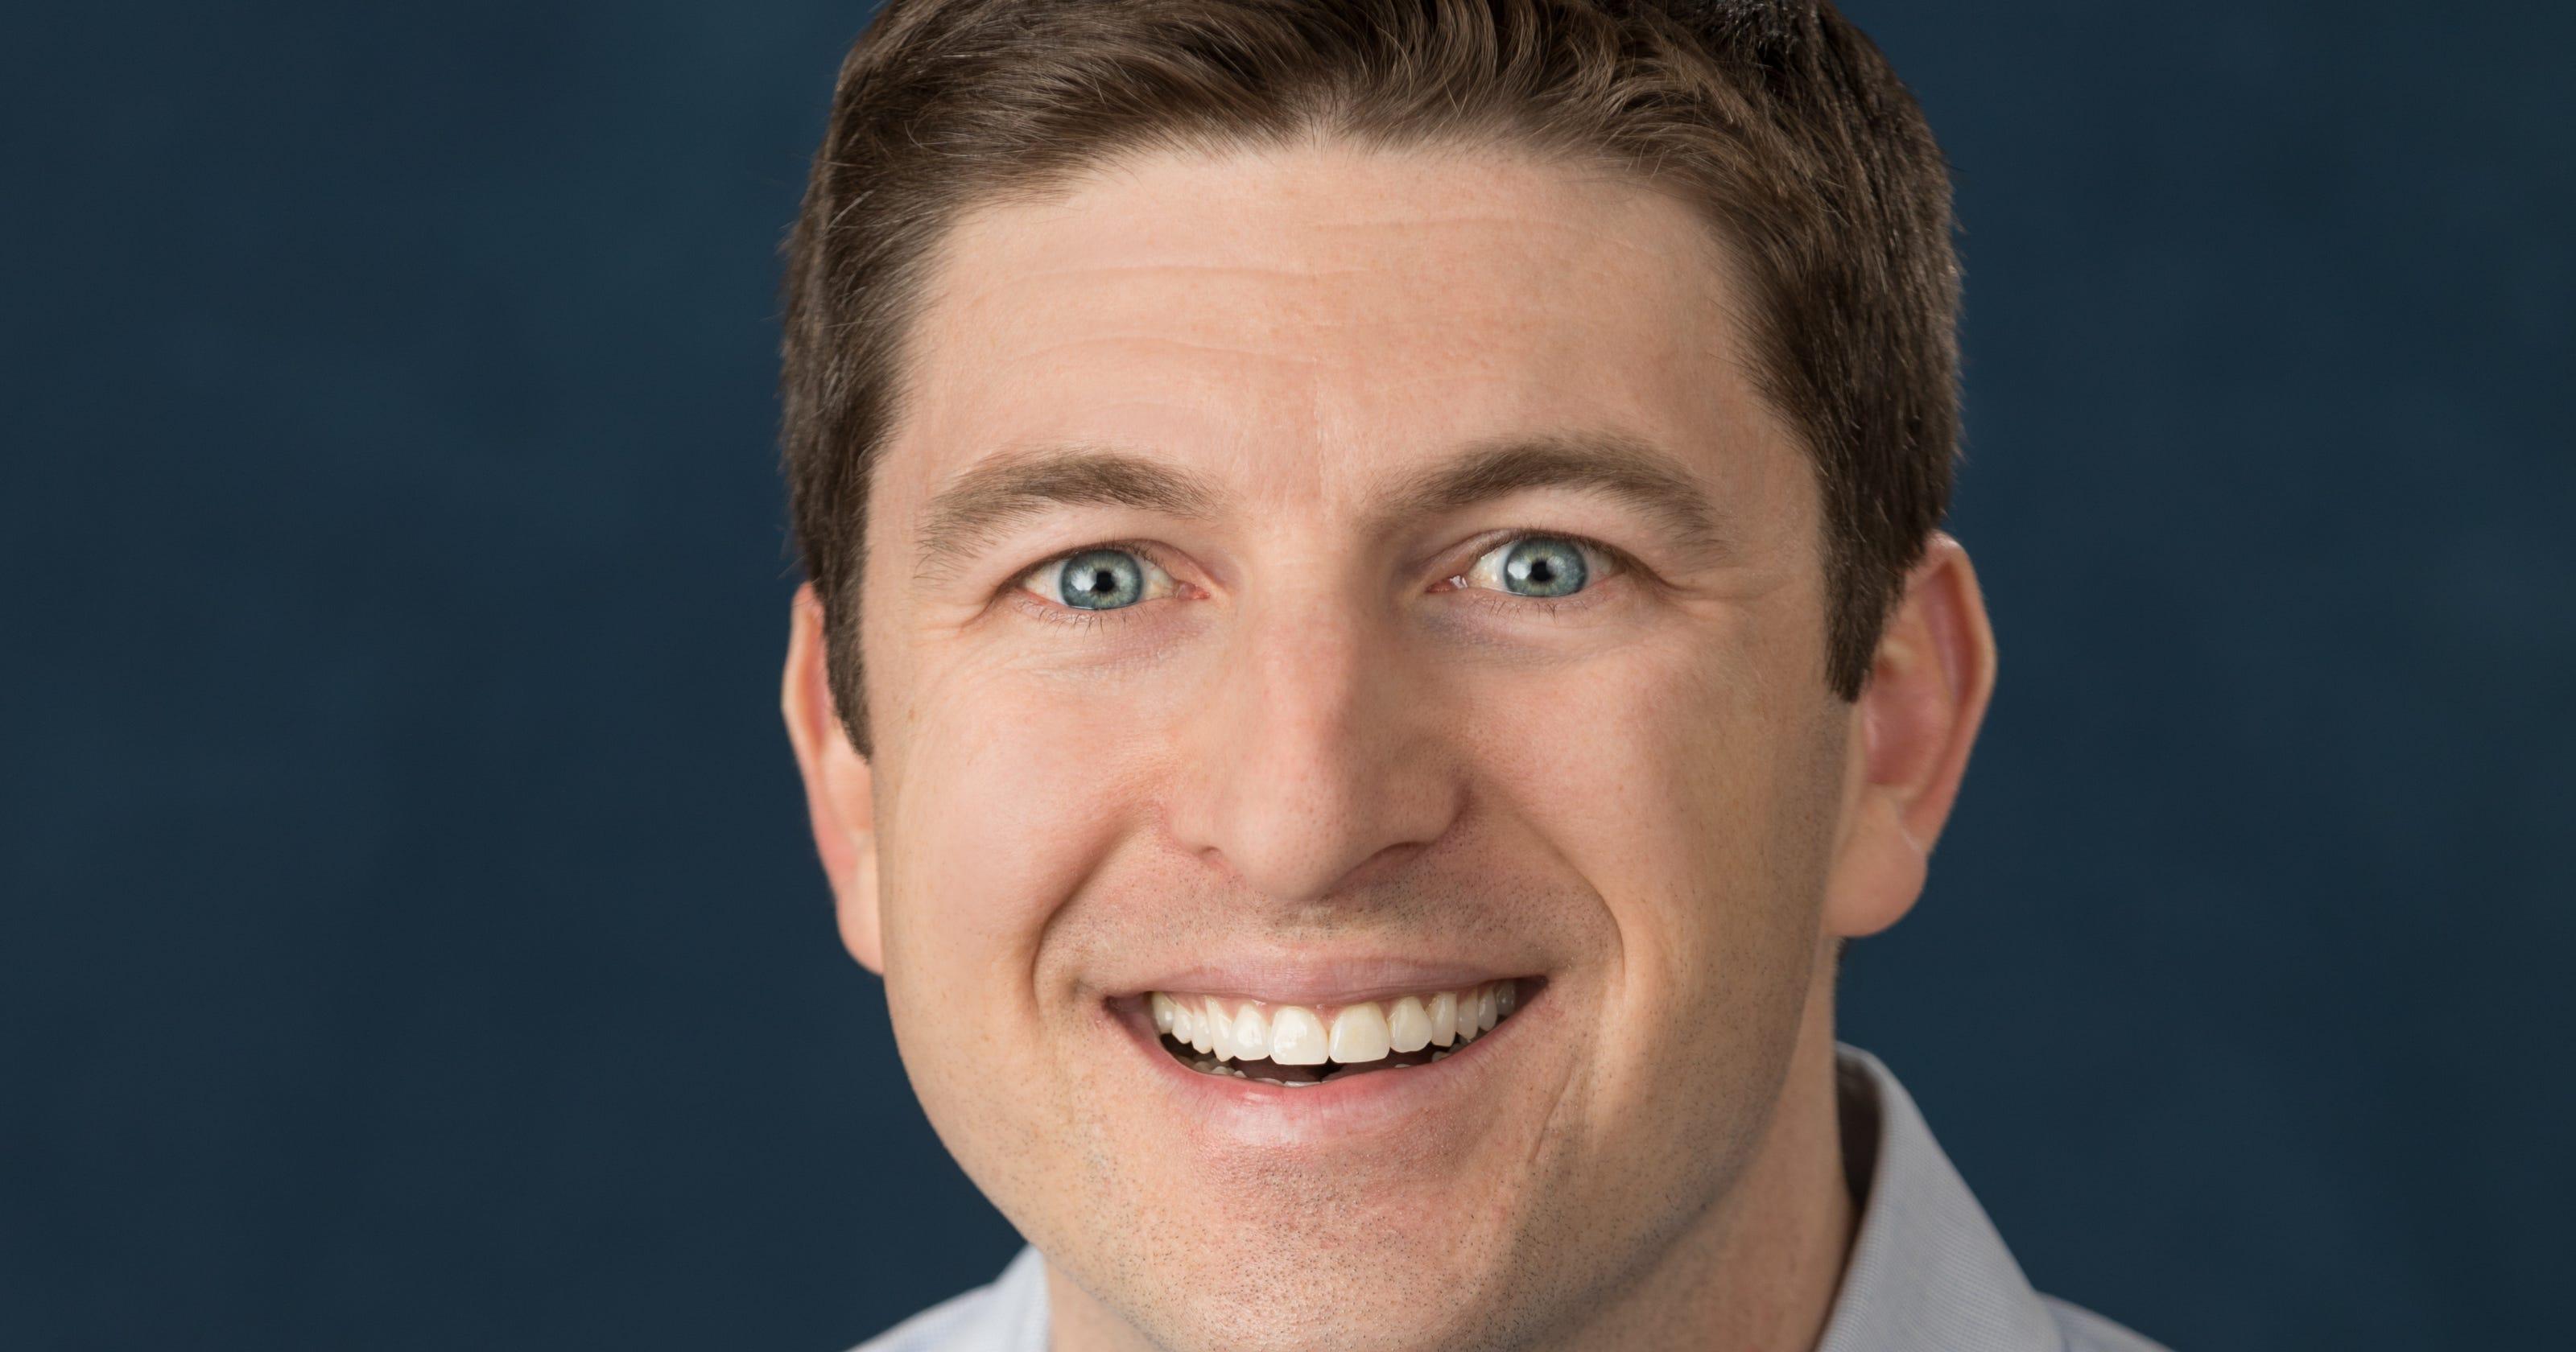 Paul Ryan retirement: Bryan Steil announces run for Ryan's seat